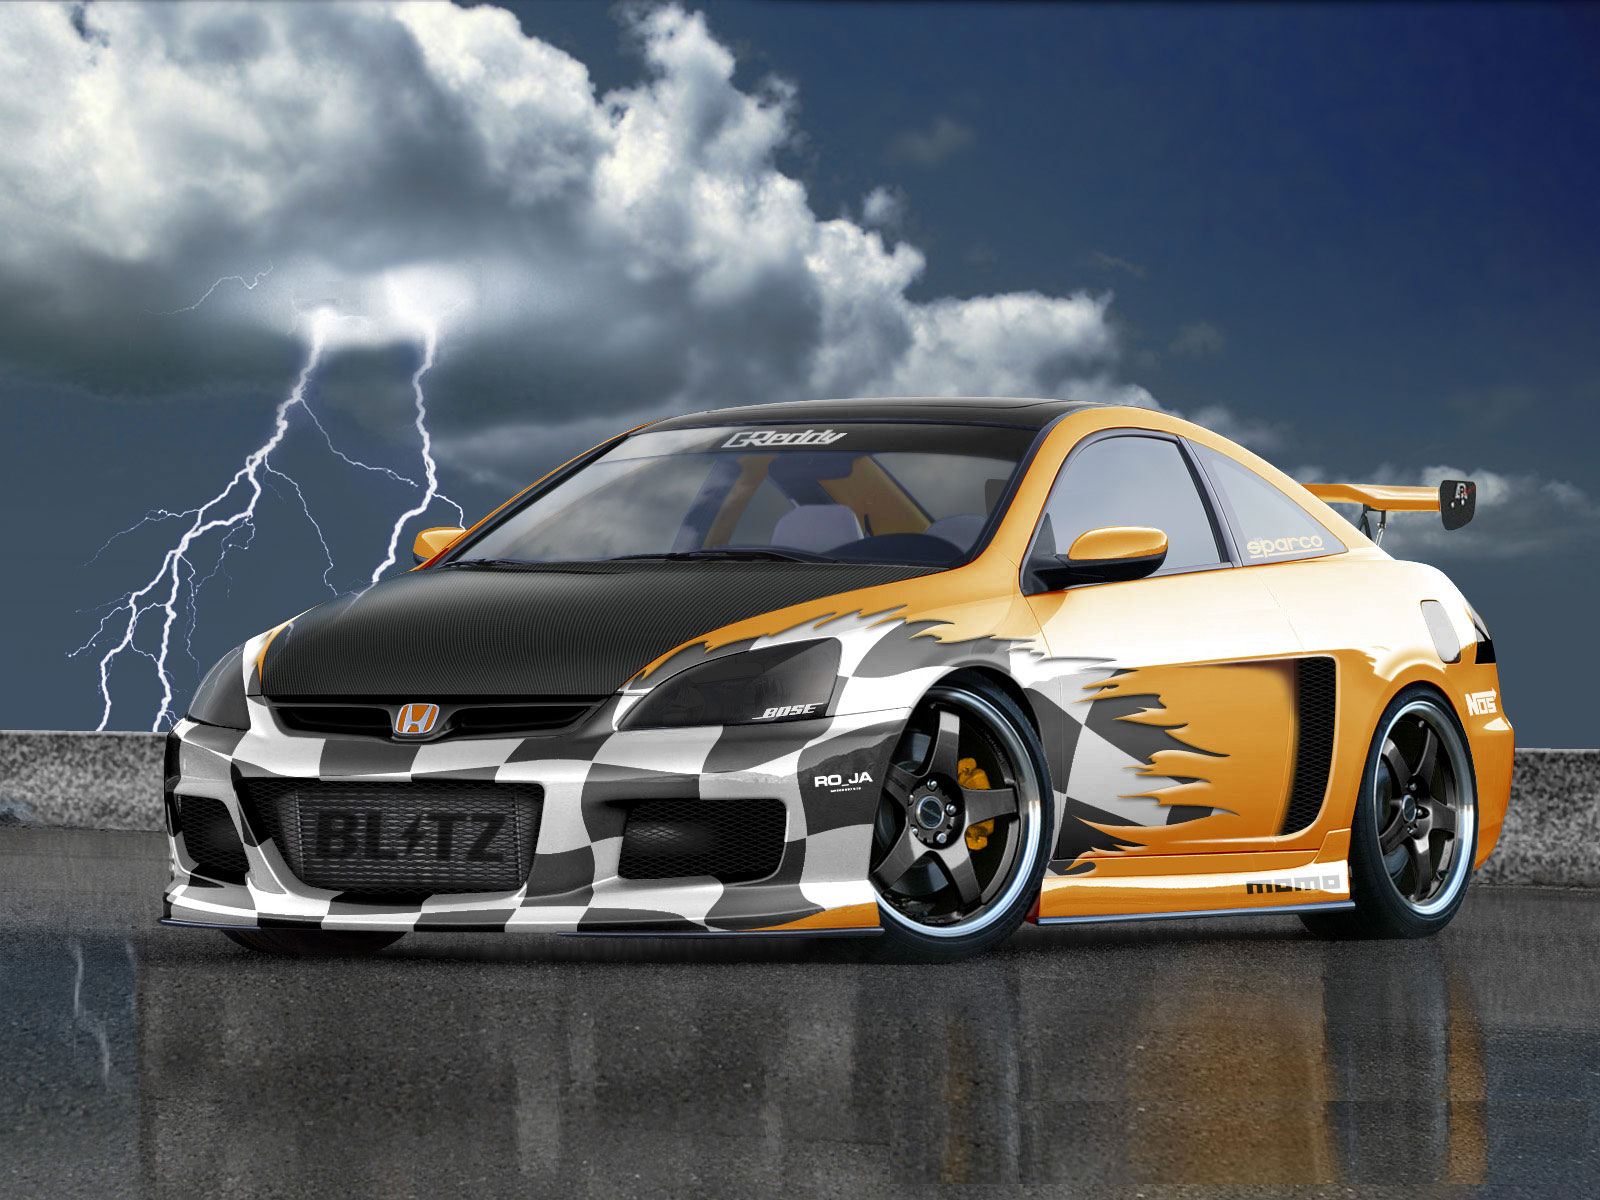 wallpaper hd fast cars top sd